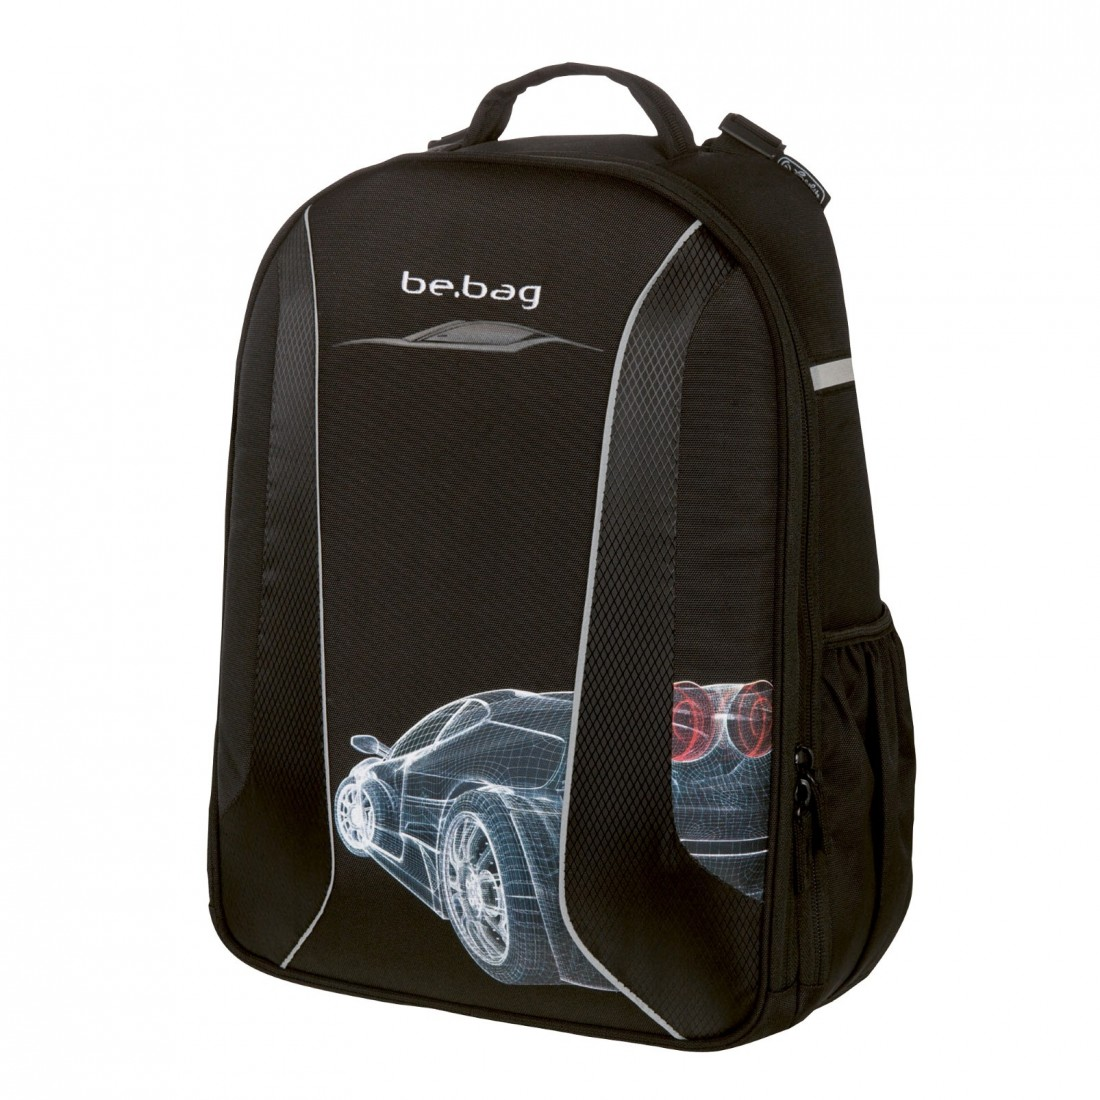 PLECAK be.bag AIRGO GRID CAR